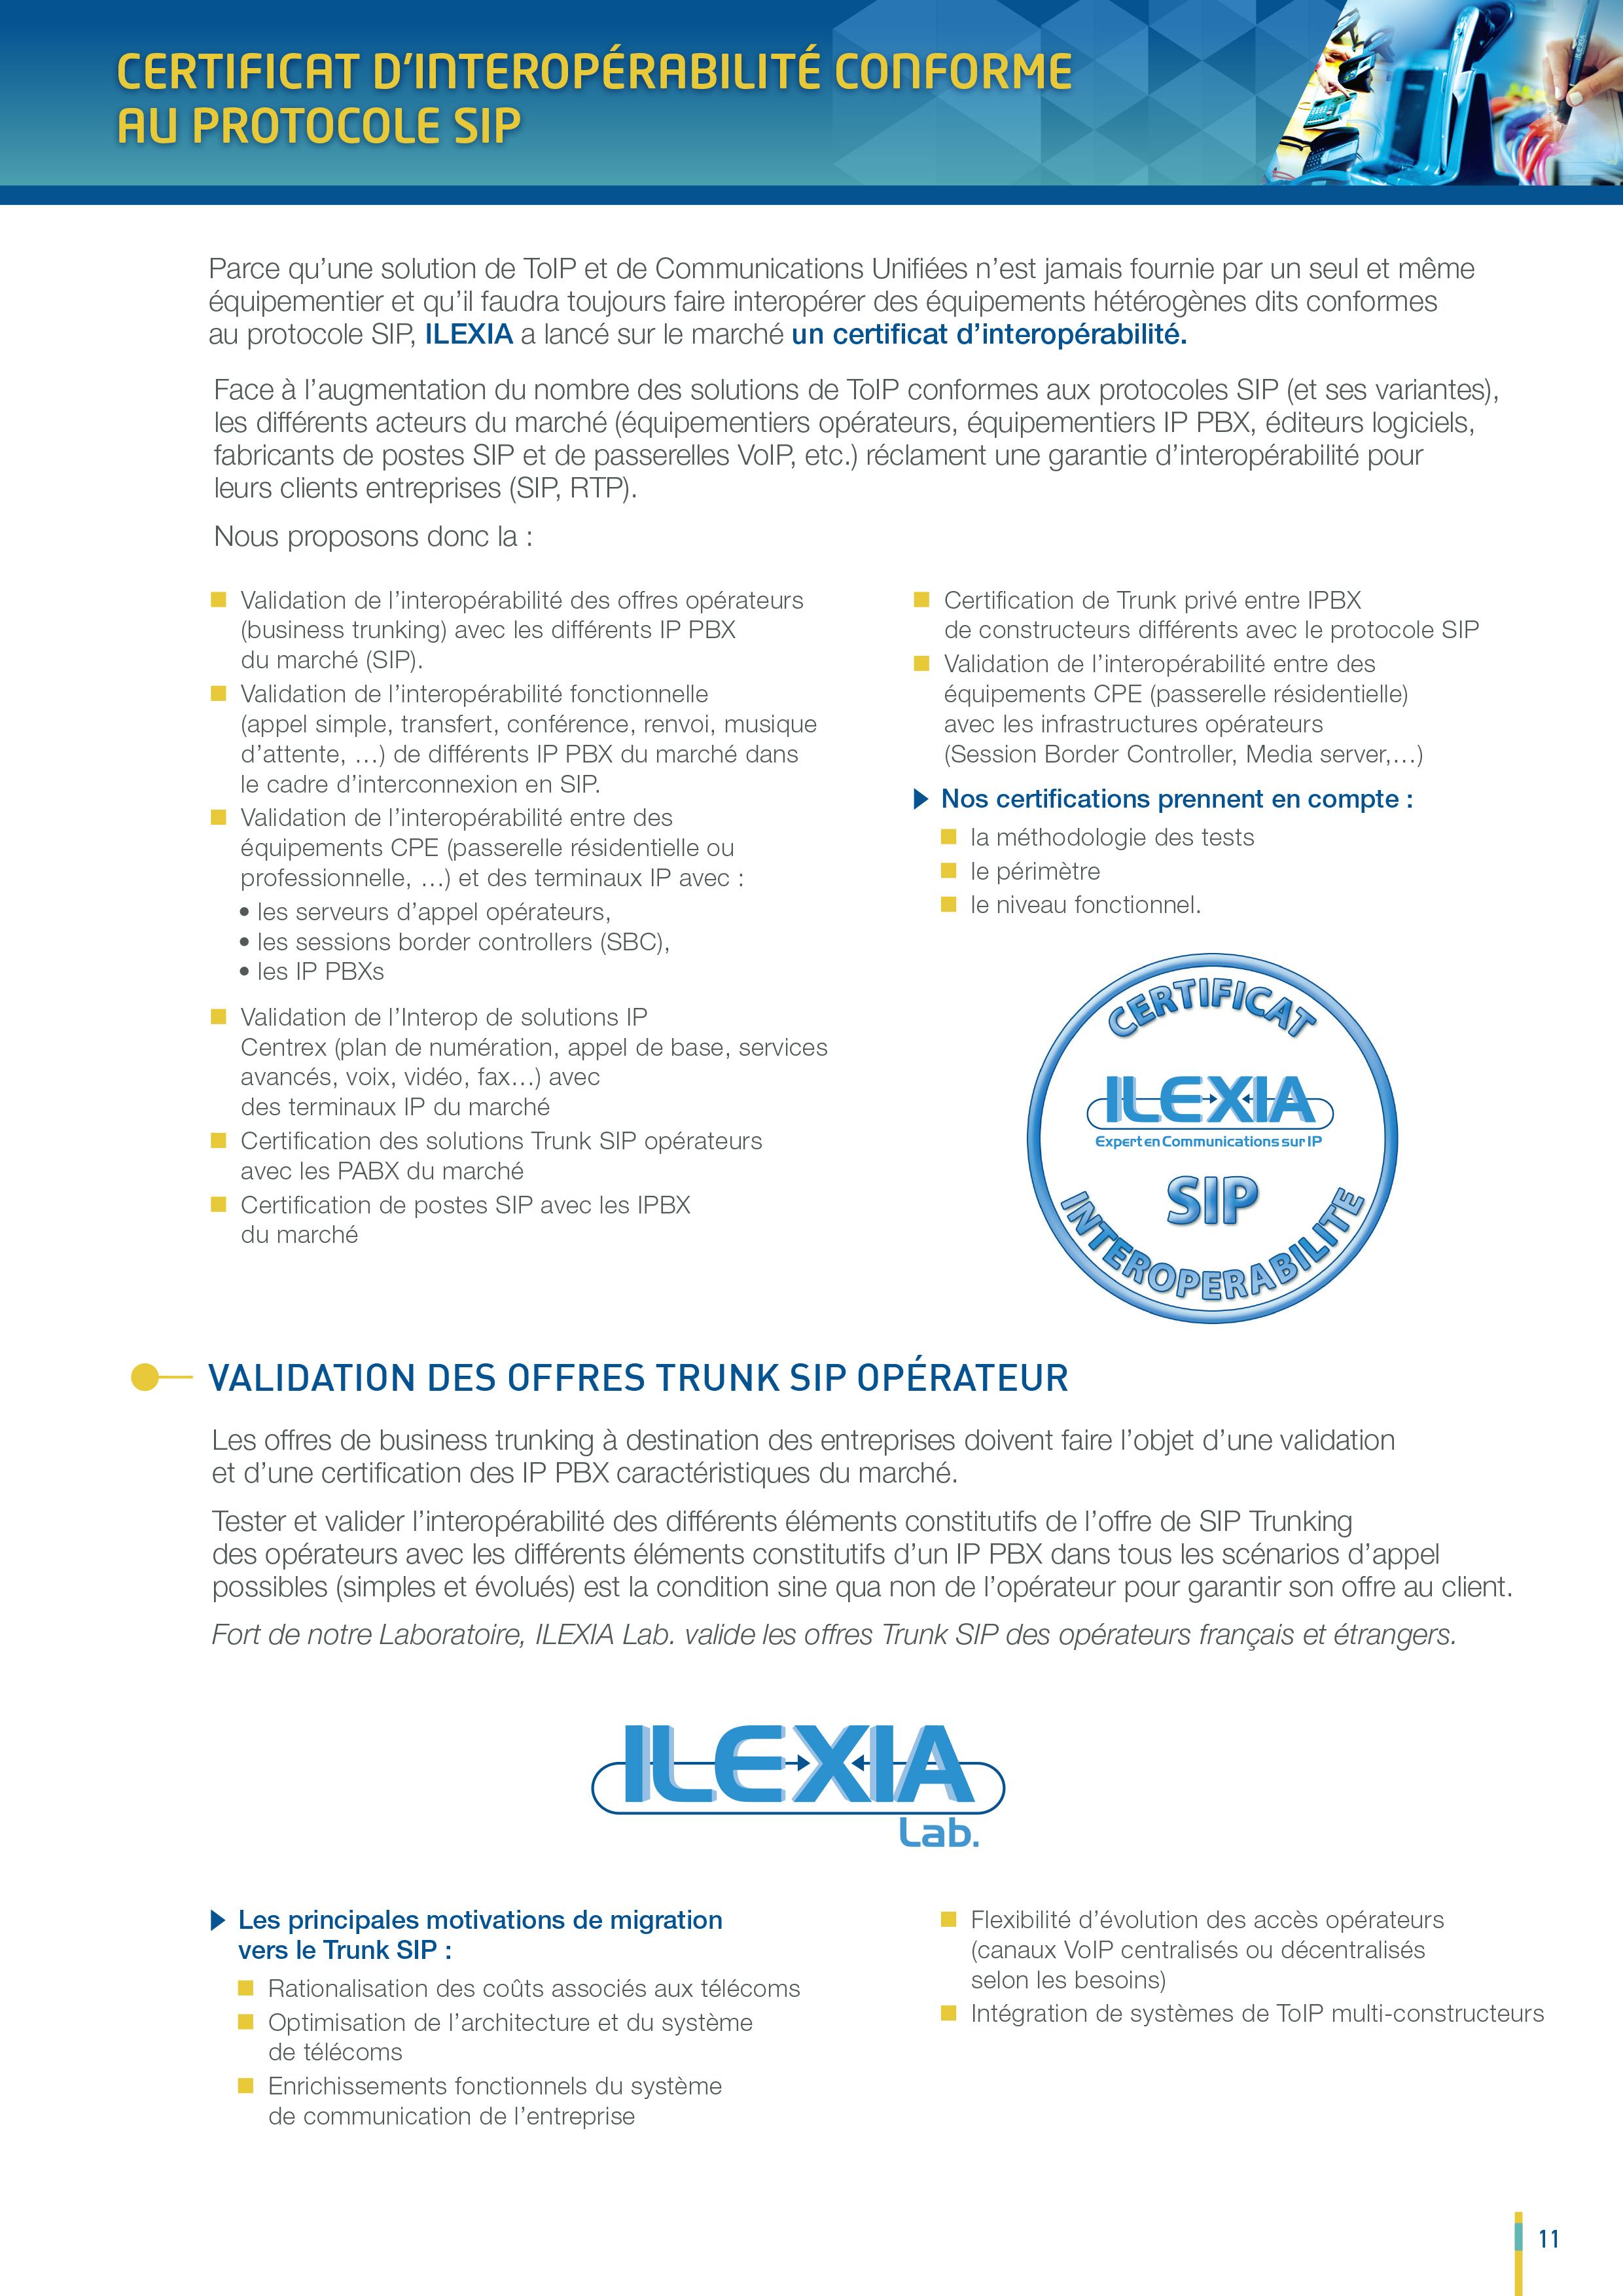 News - Ilexia - Expert en Communications sur IP